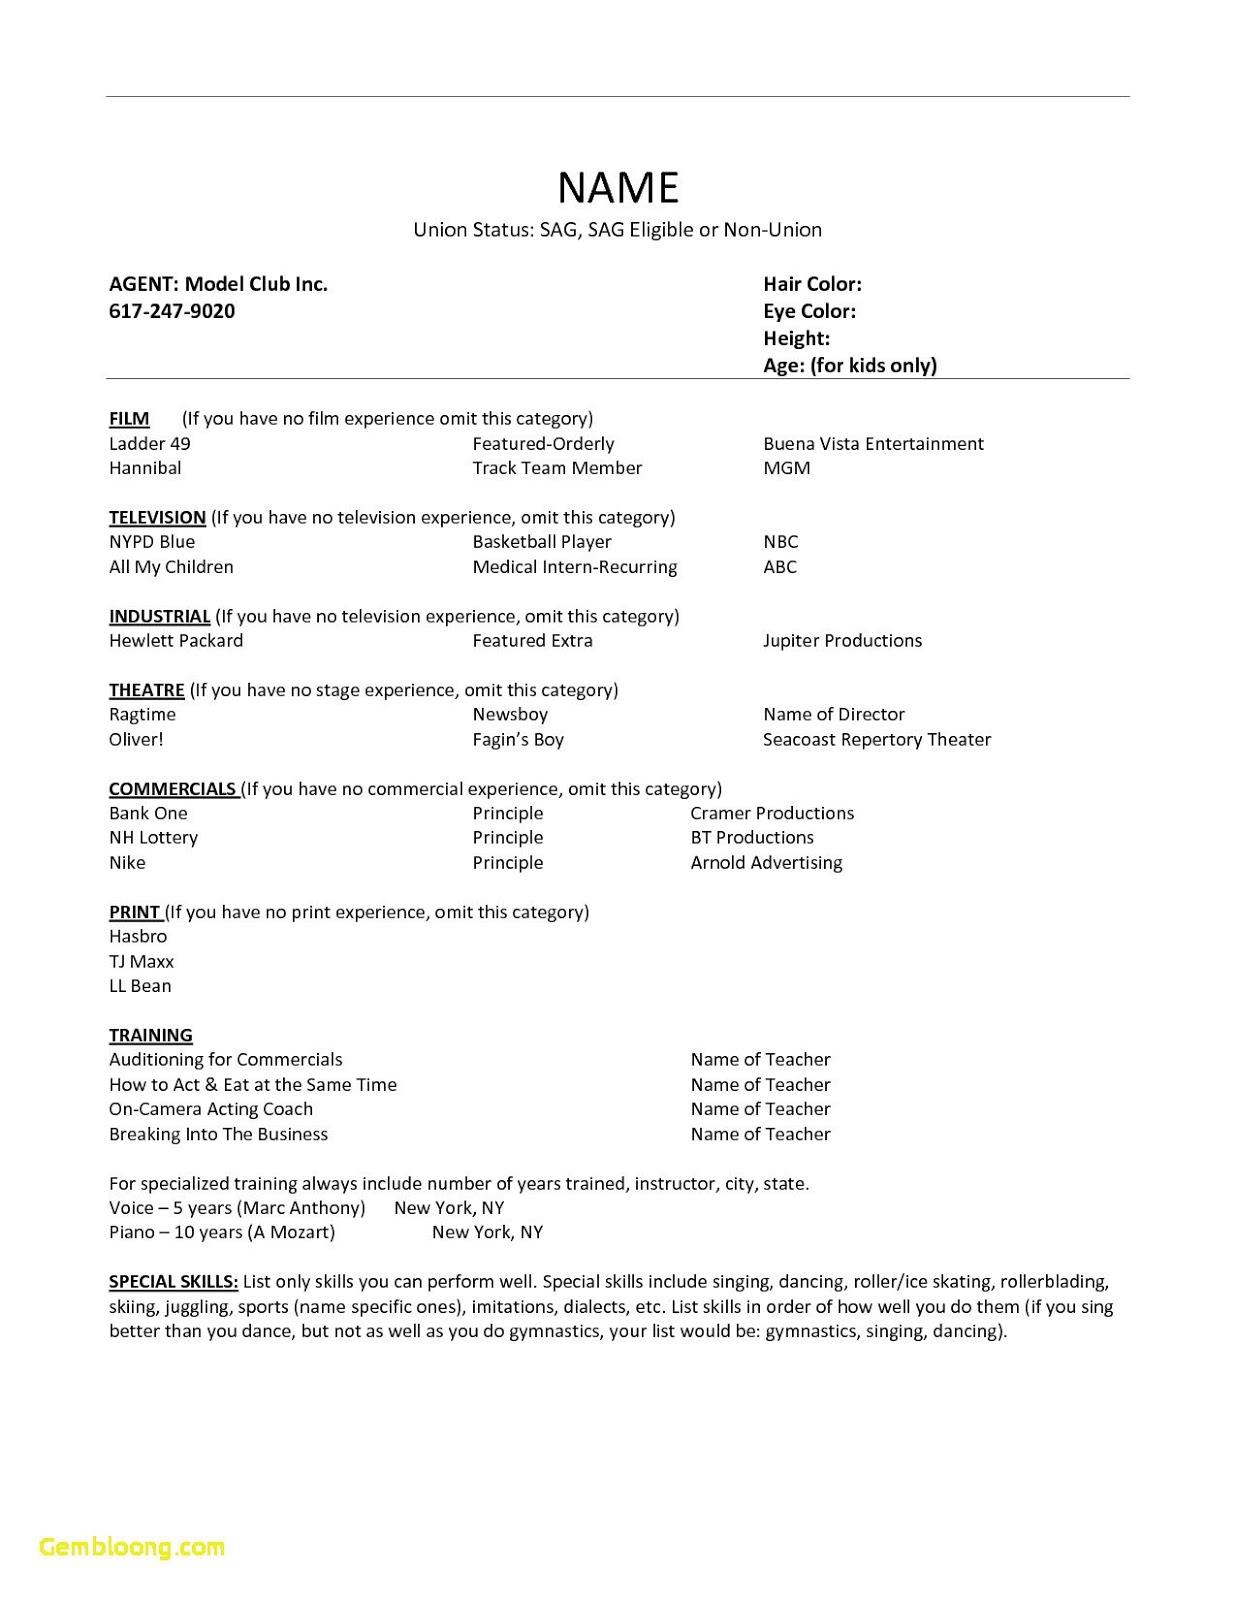 kids acting resume children's acting resume no experience 2019 children's acting resume children's acting resume template youth acting resume sample 2020 youth acting resume template youth acting resume